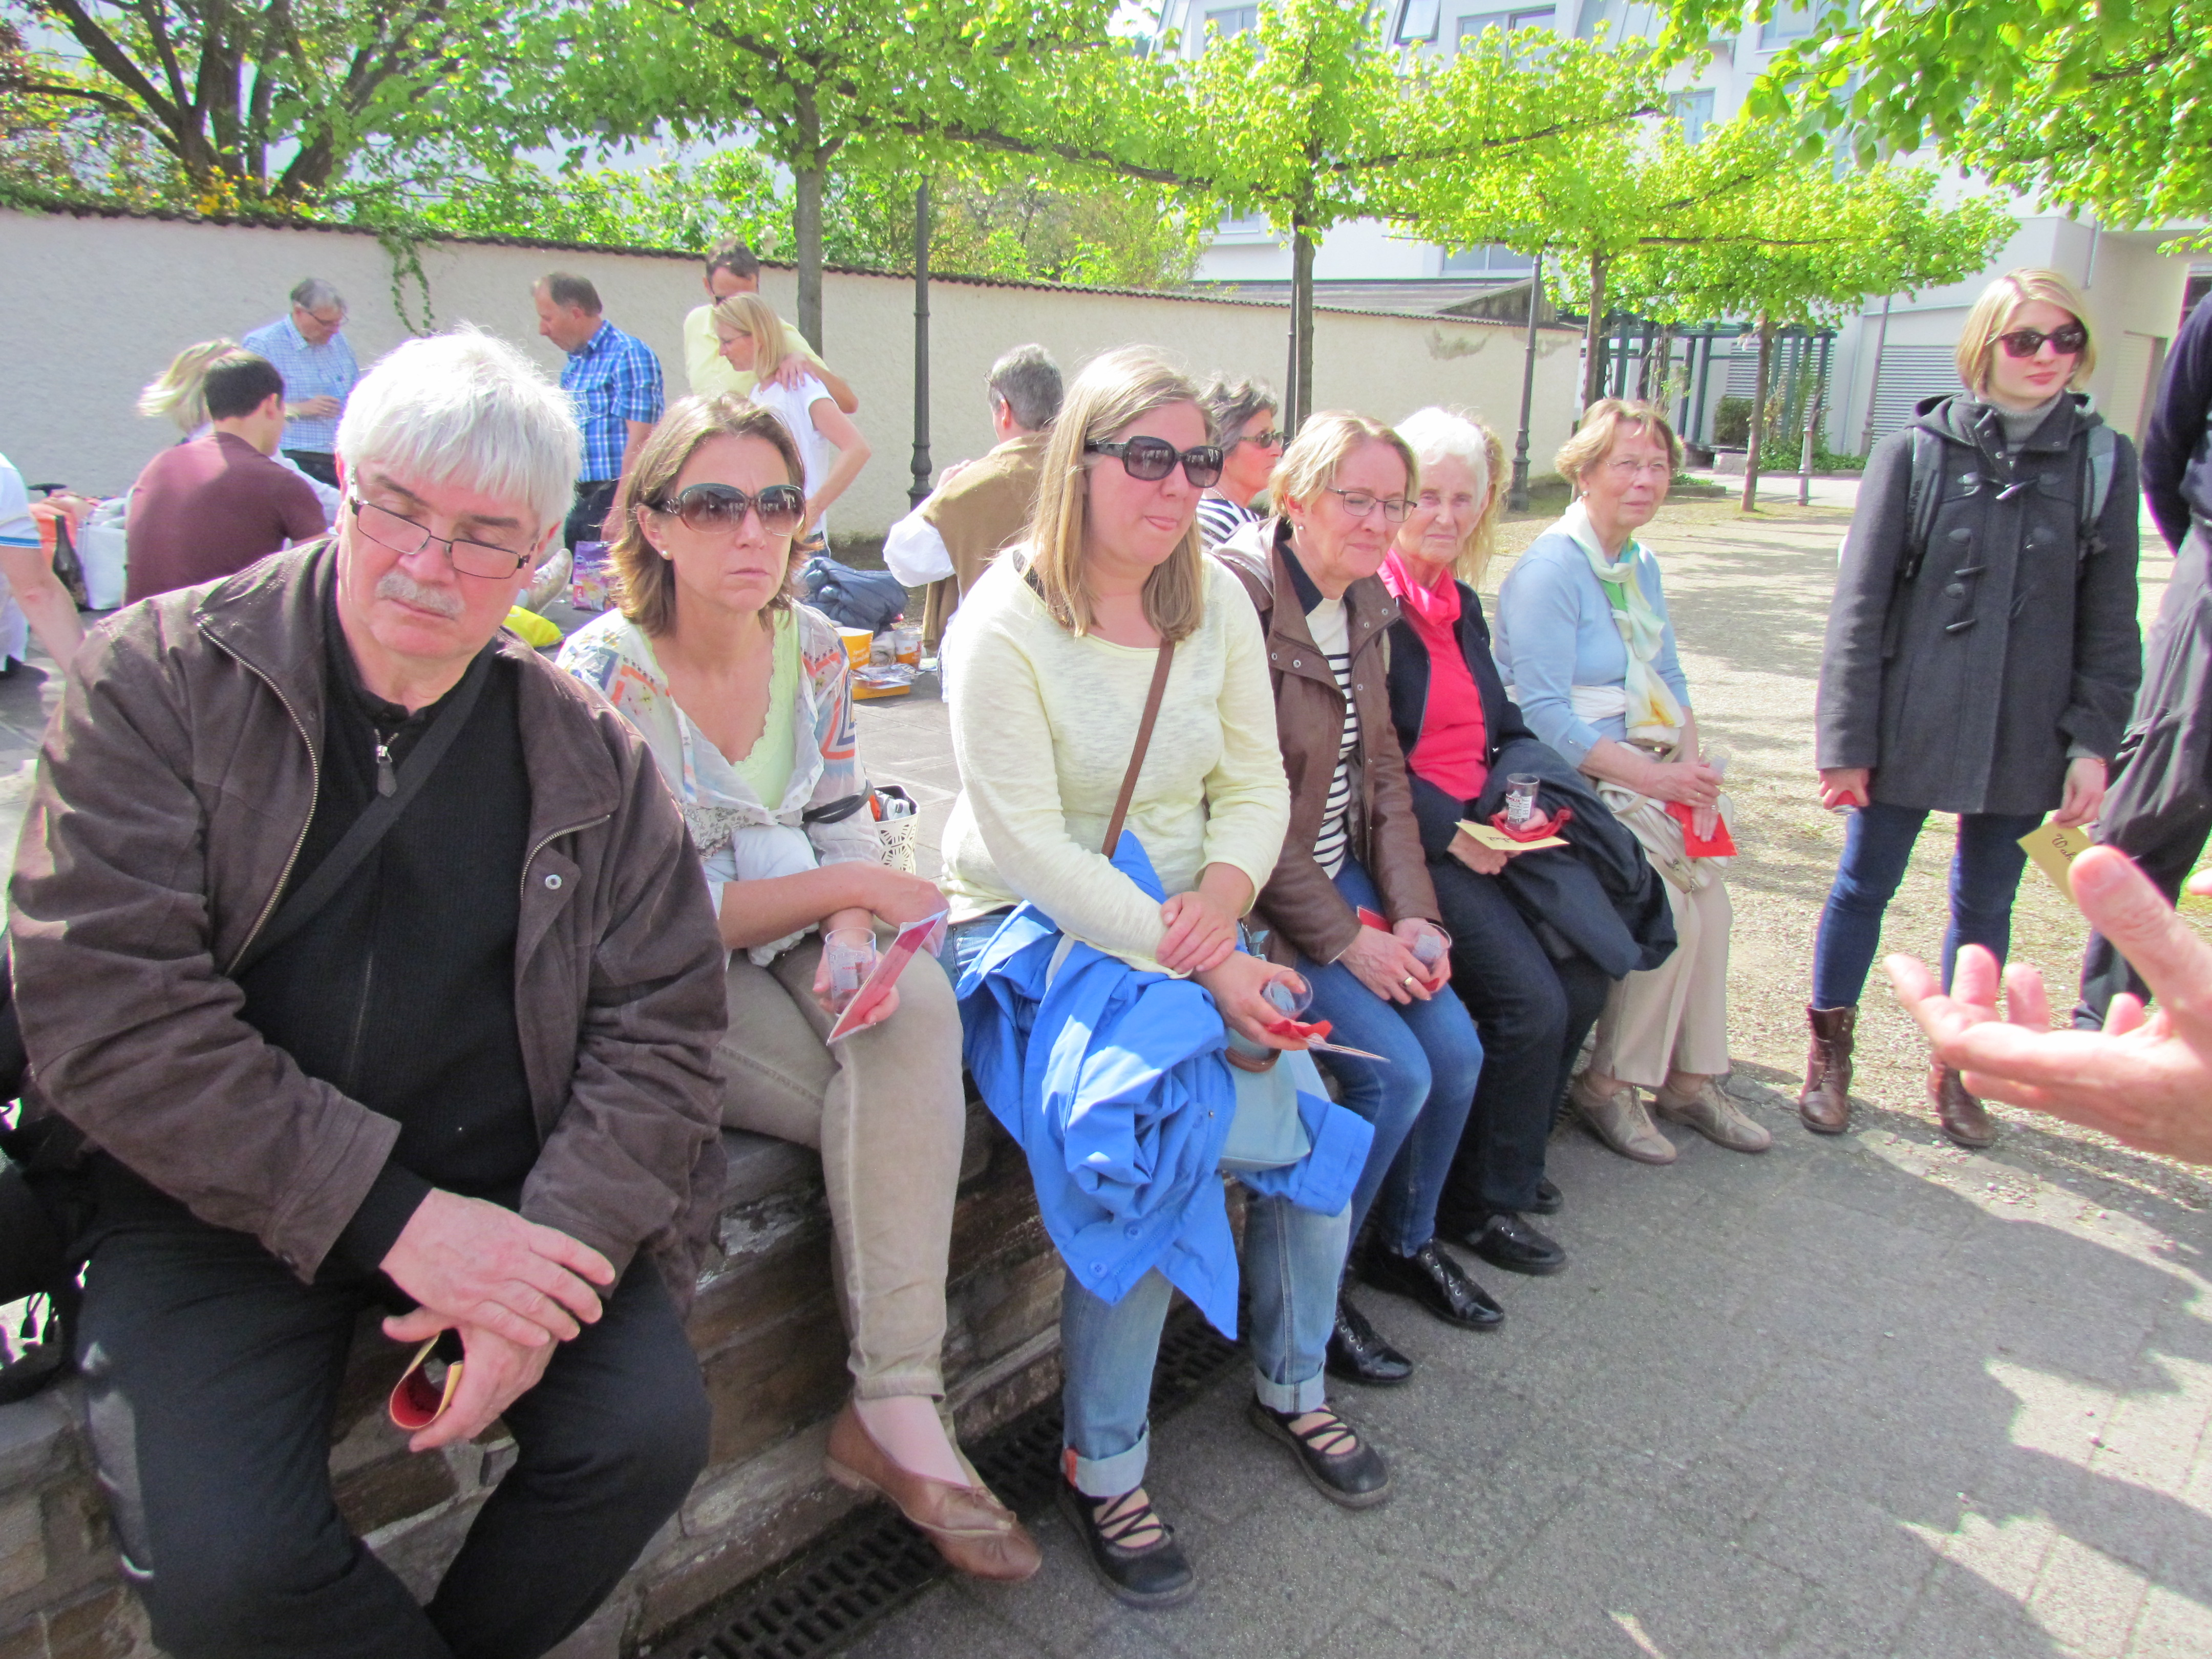 2017-05-Mai-06-Chorausflug-Ahrweiler_Bernd-Finken_041